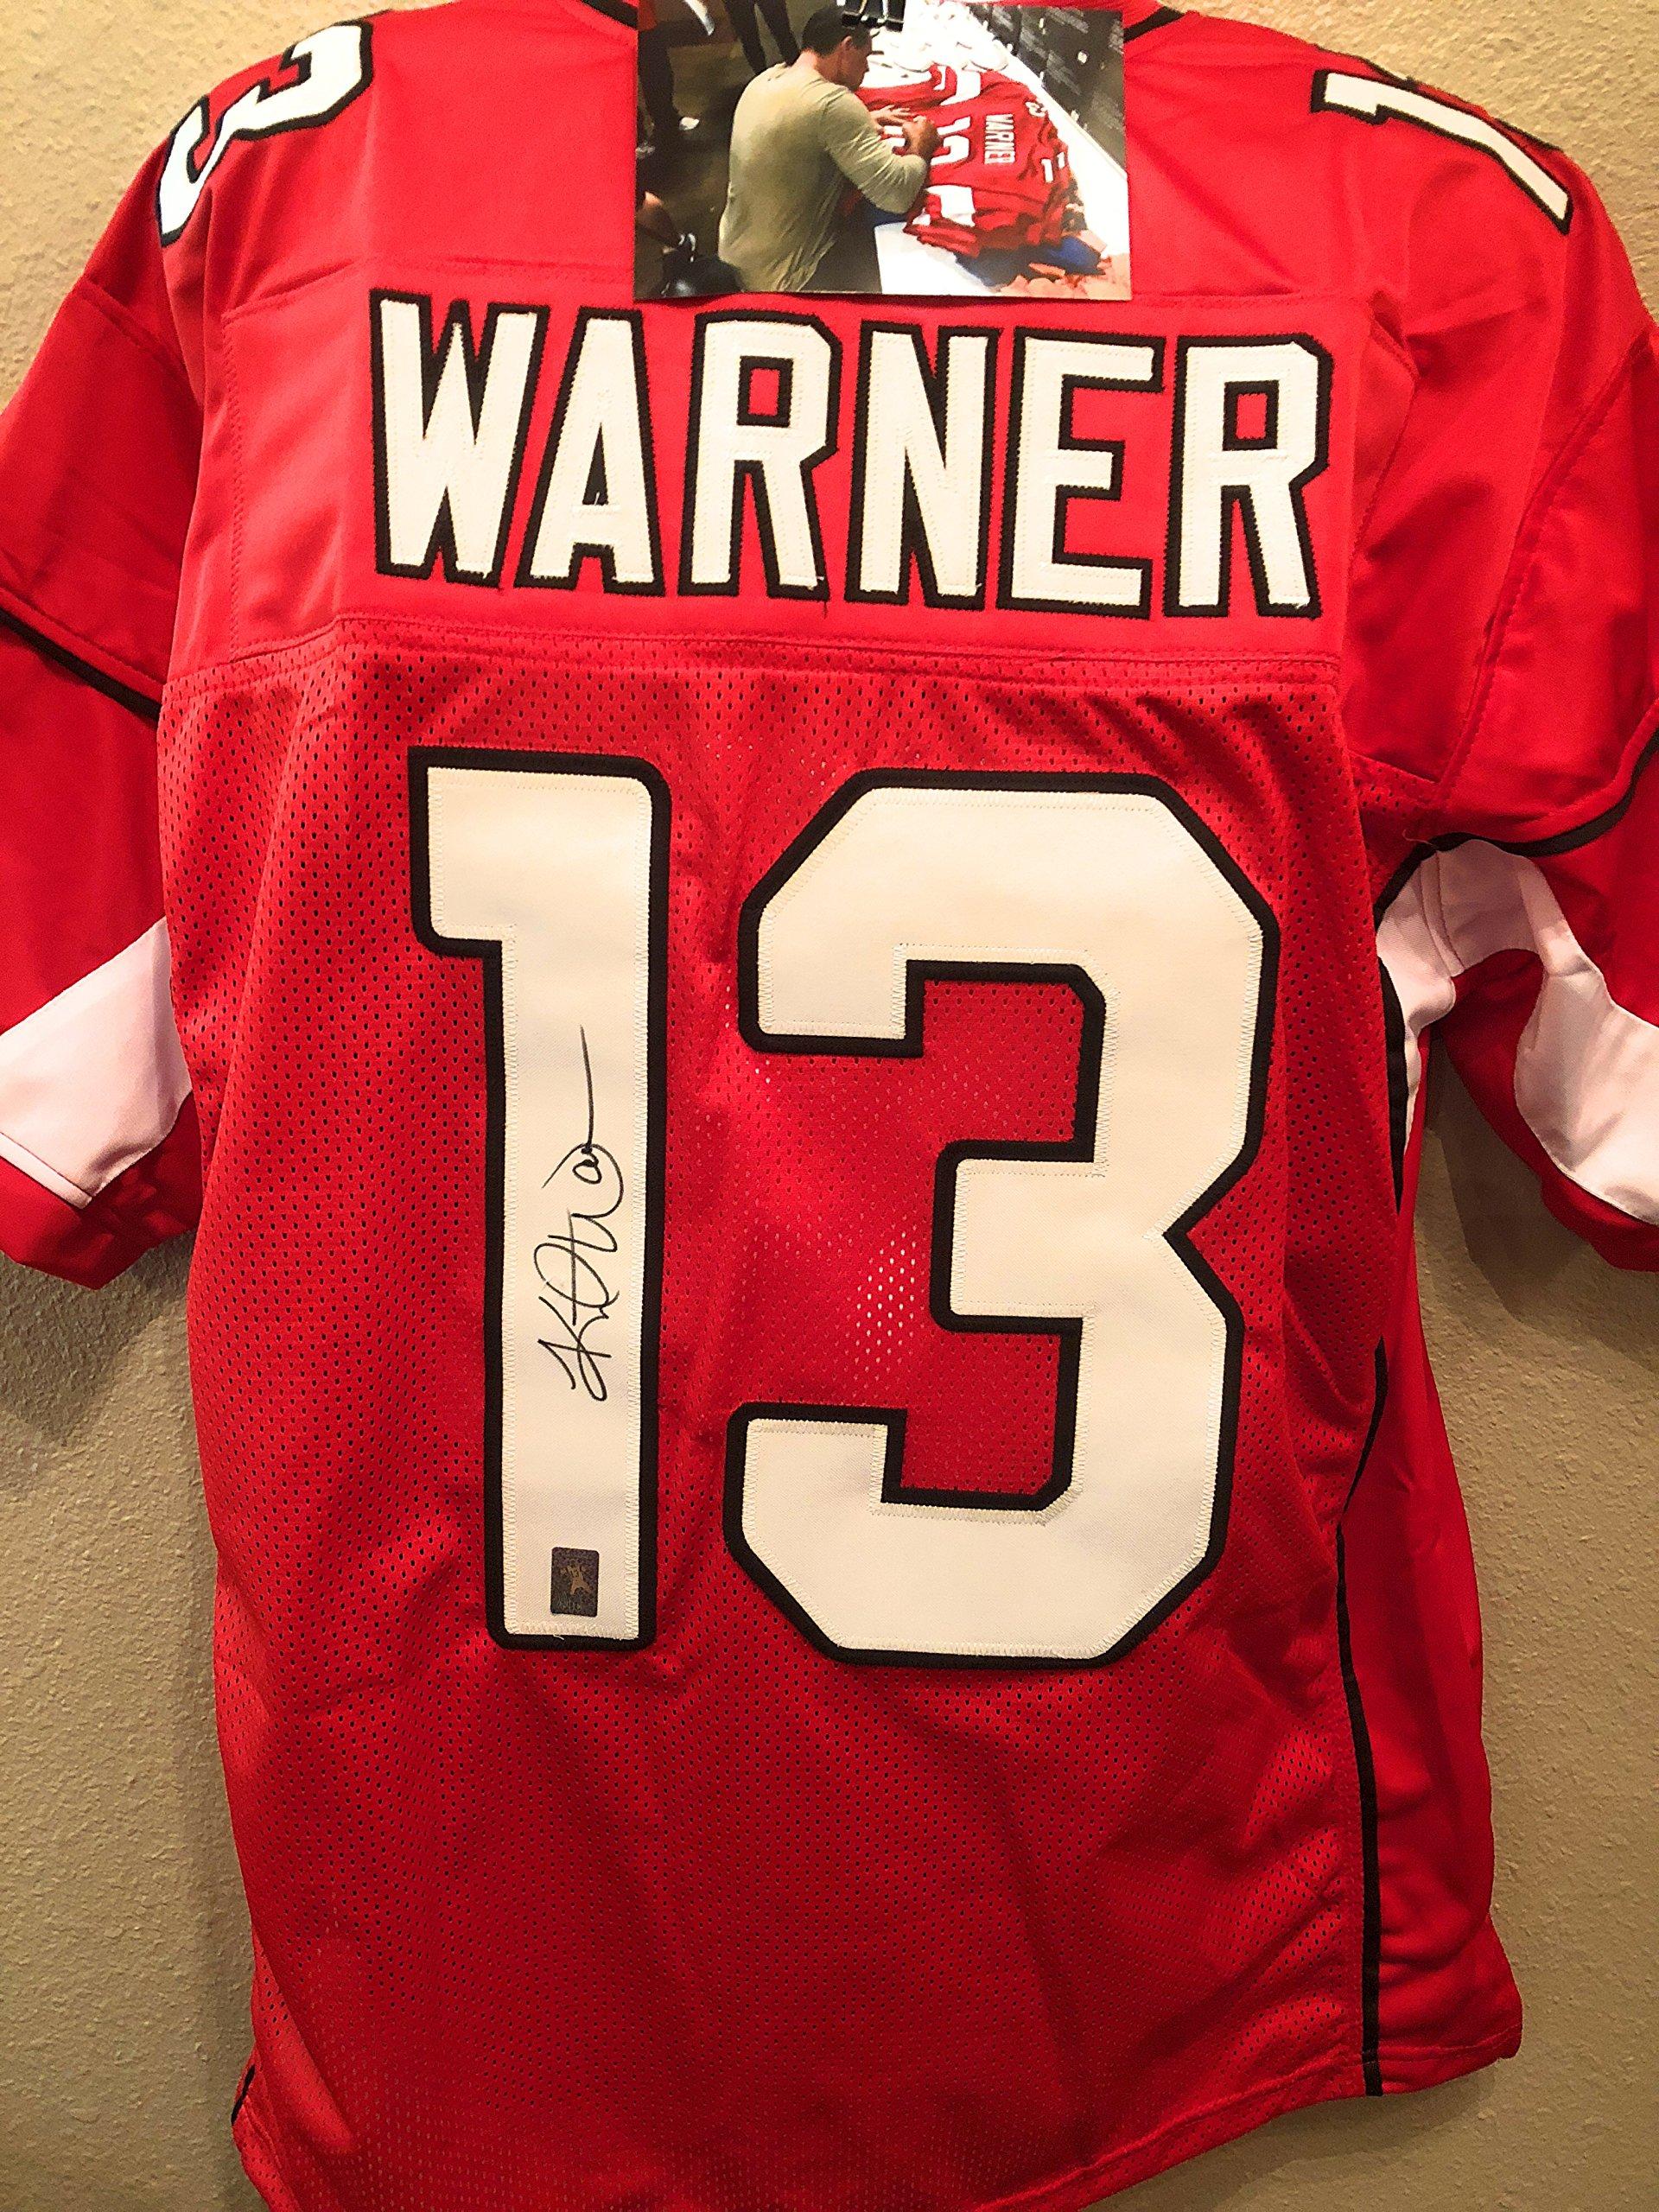 Kurt Warner Arizona Cardinals Signed Autograph Red Custom Jersey Warner Athlete Hologram W/Photo Proof